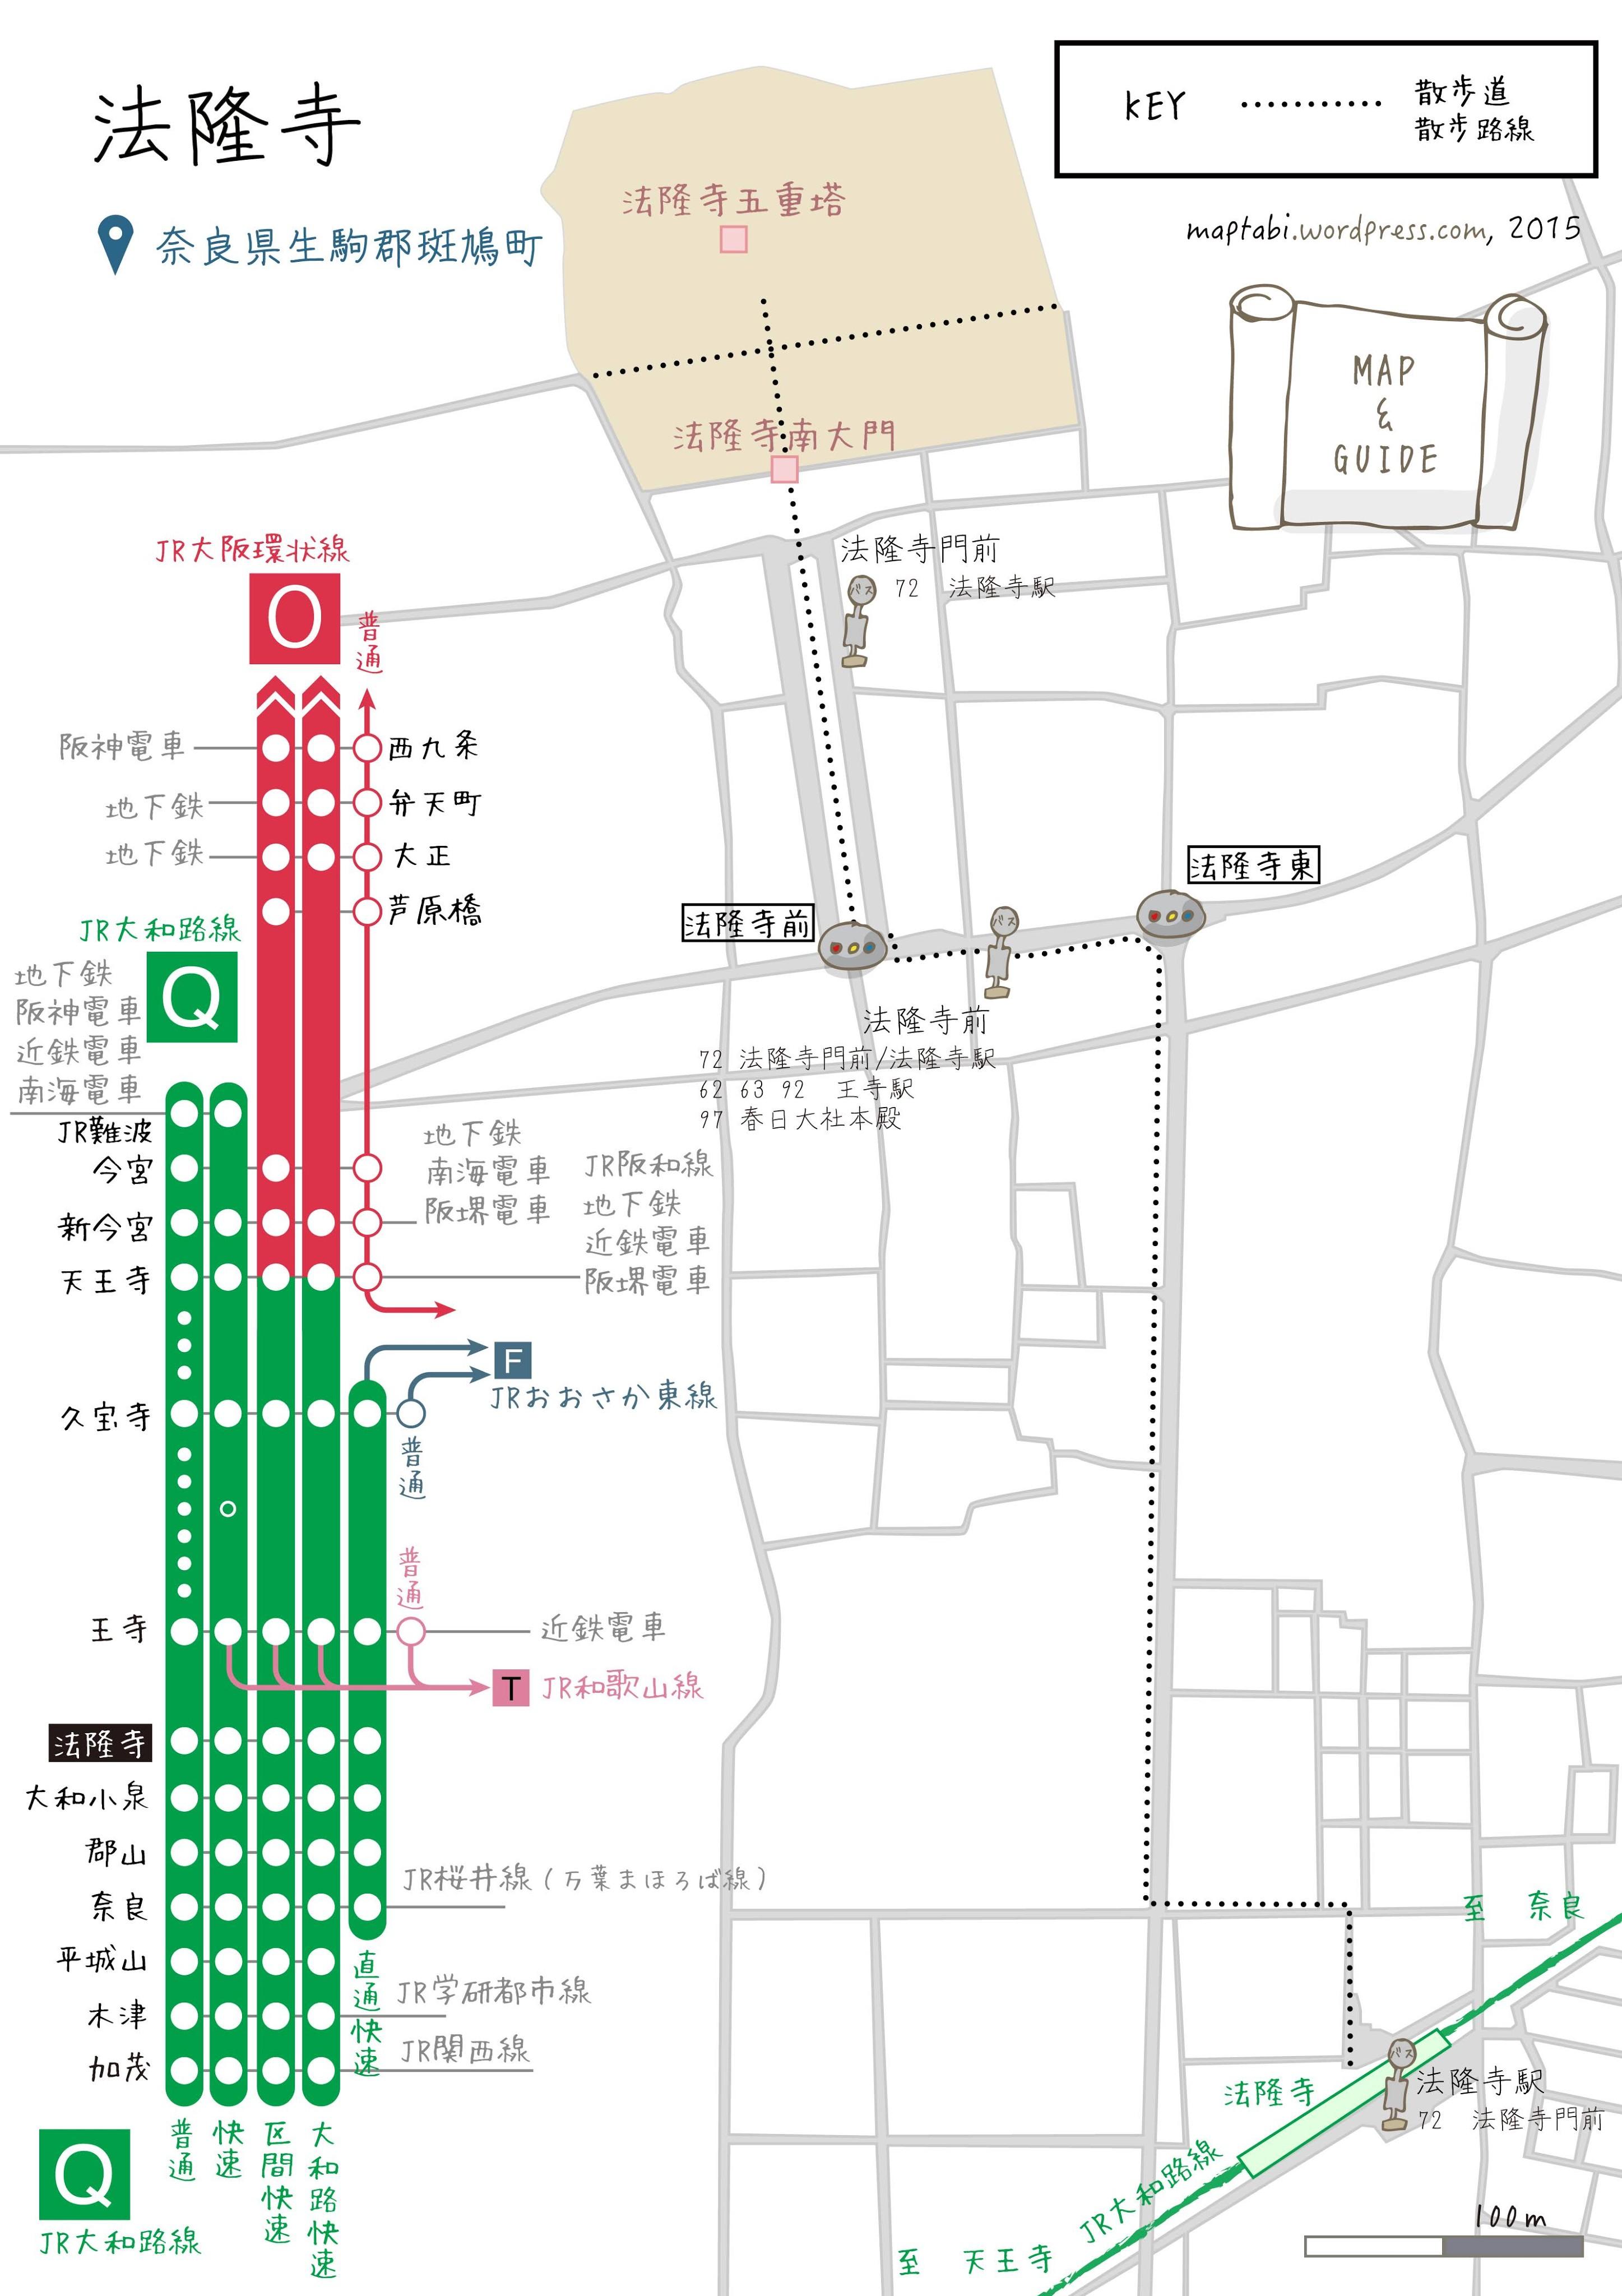 houryuji_map_22819747405_o